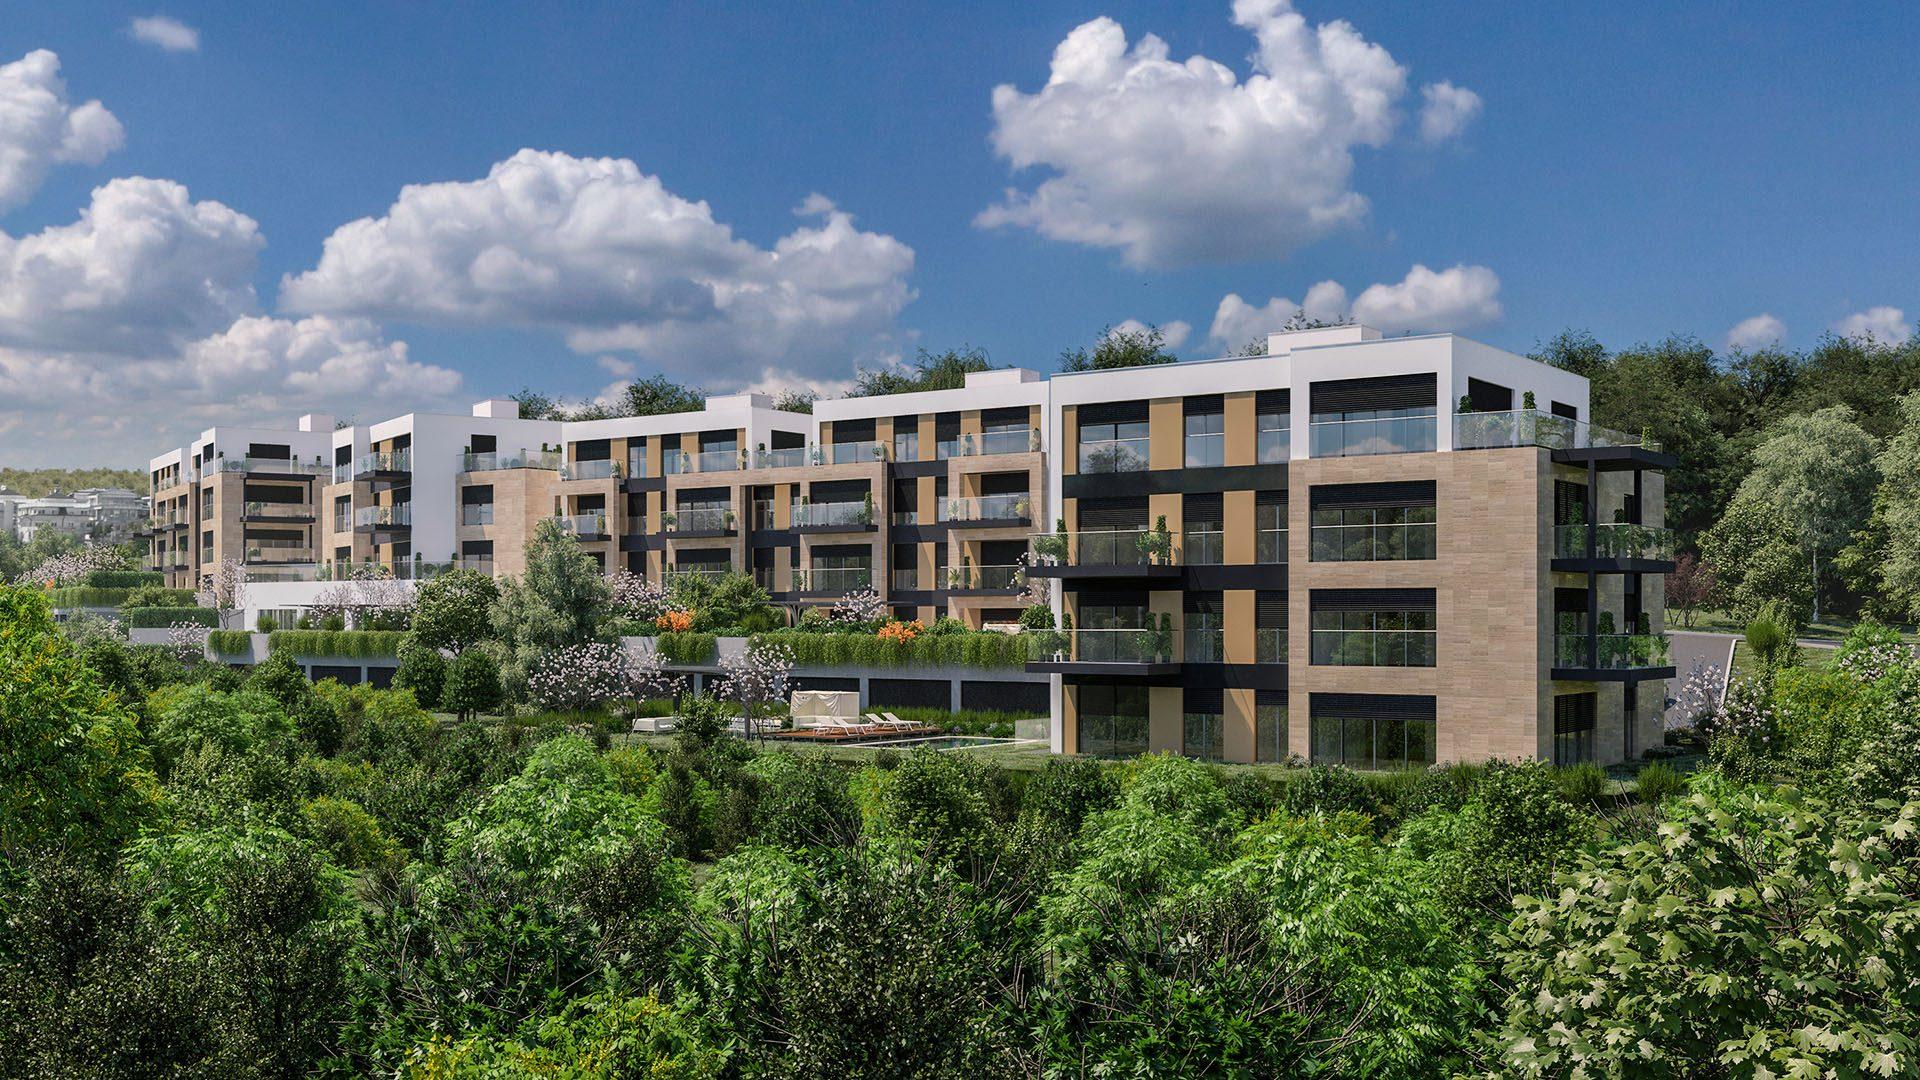 Prodaja stanova Beograd - Green Hill Dedinje.